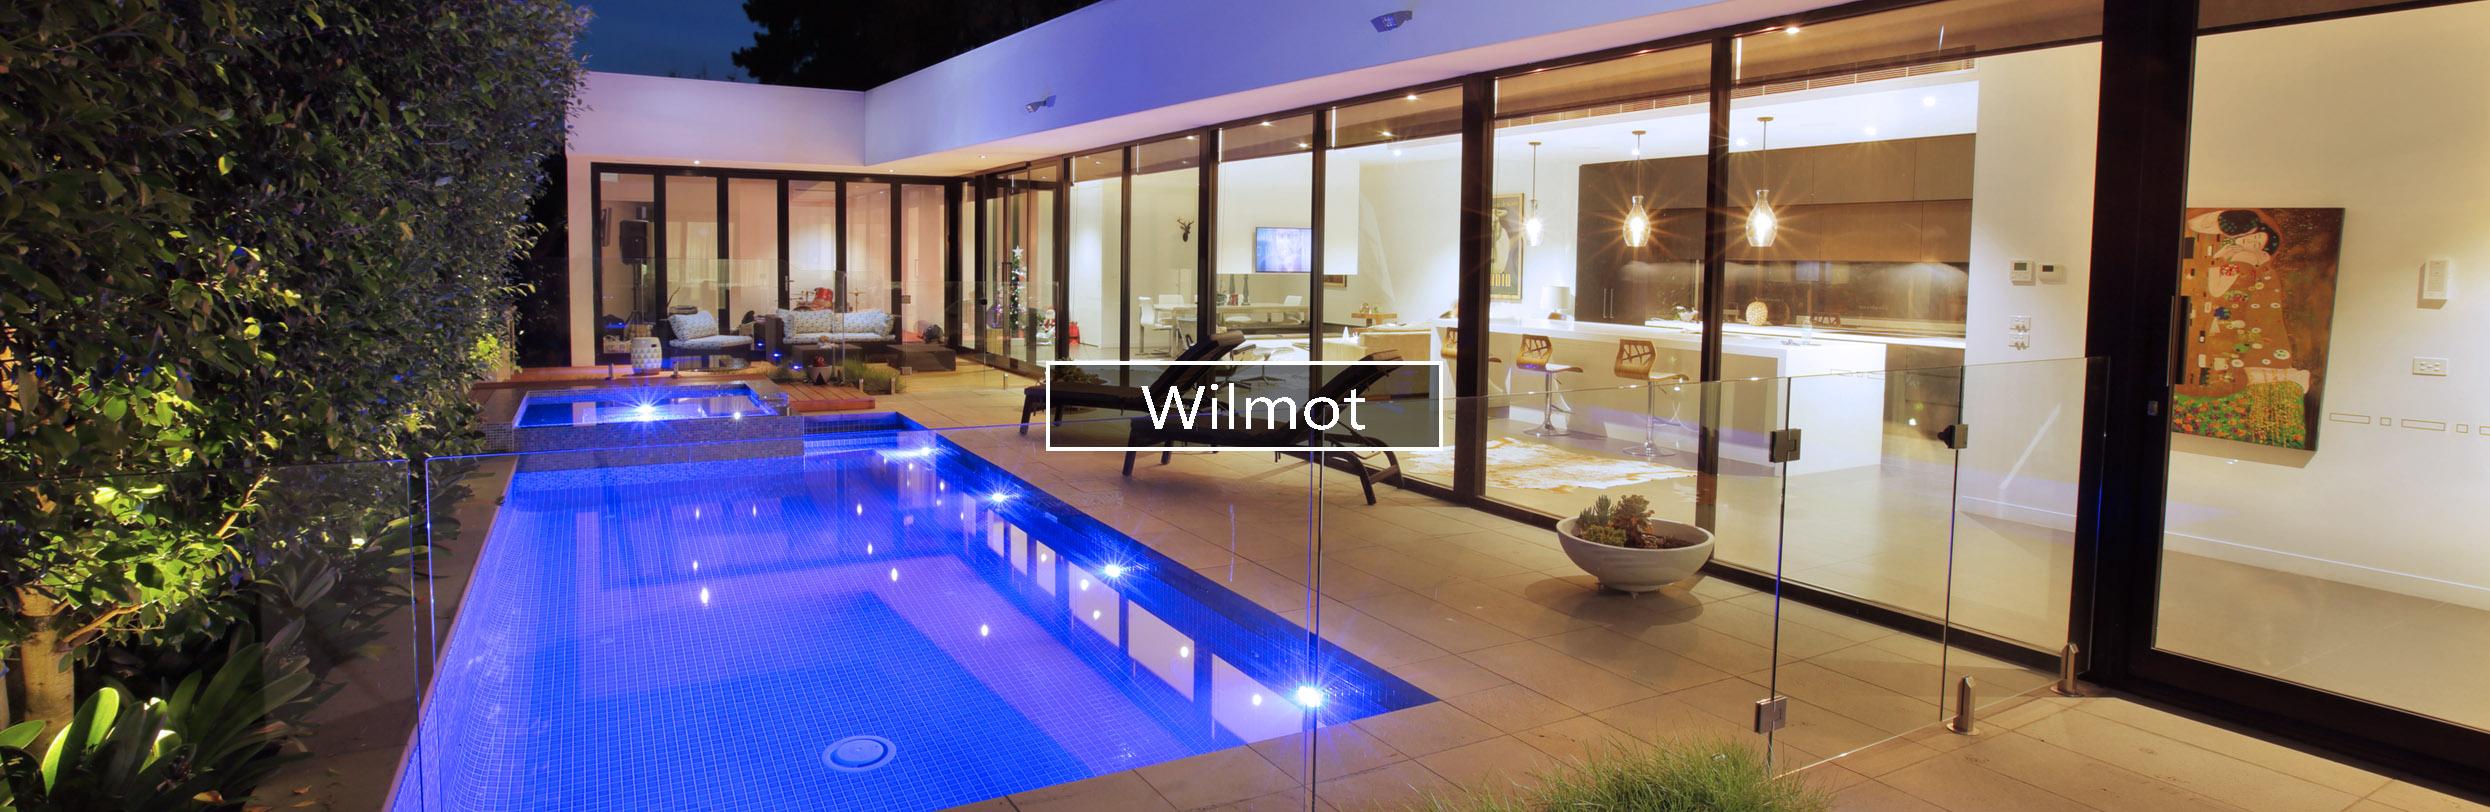 Wilmot - Kiama Pools Swimming Pool Project